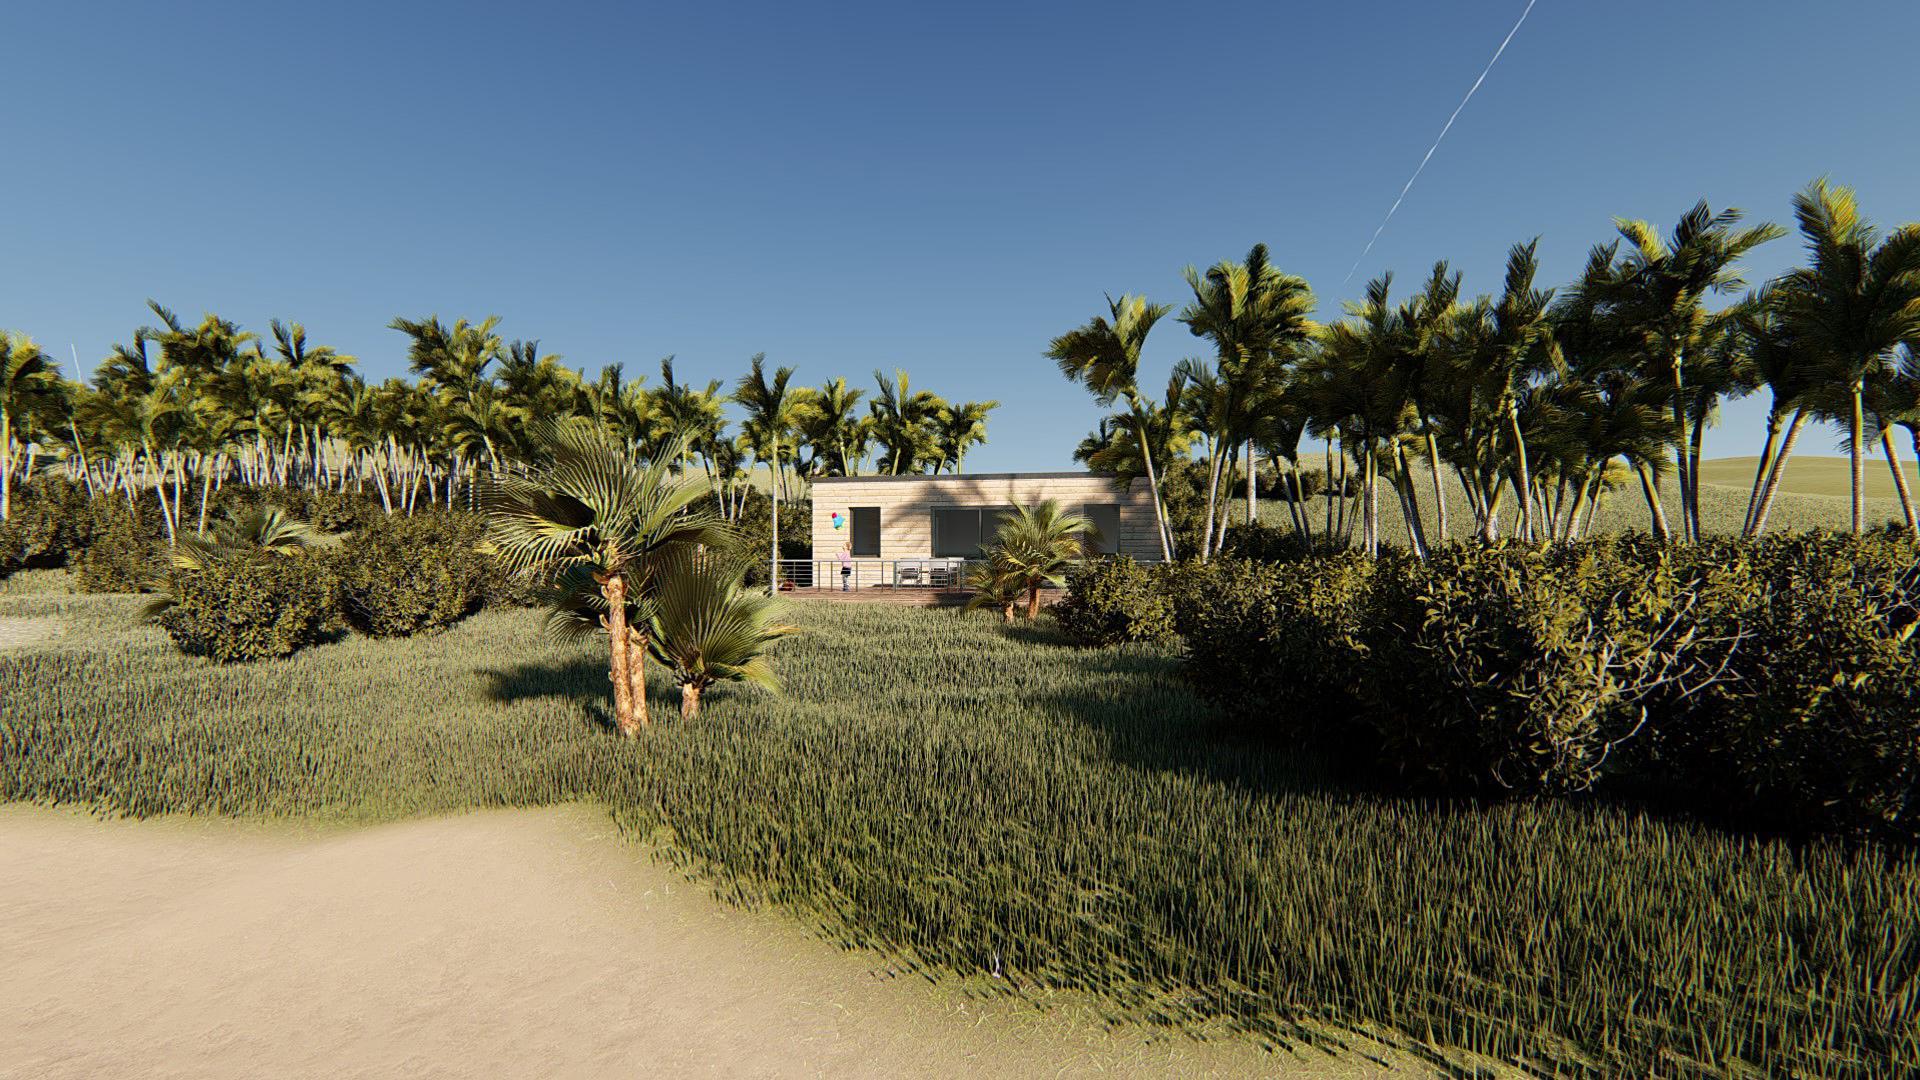 Studio de jardin 45 mobil home camping vue plage